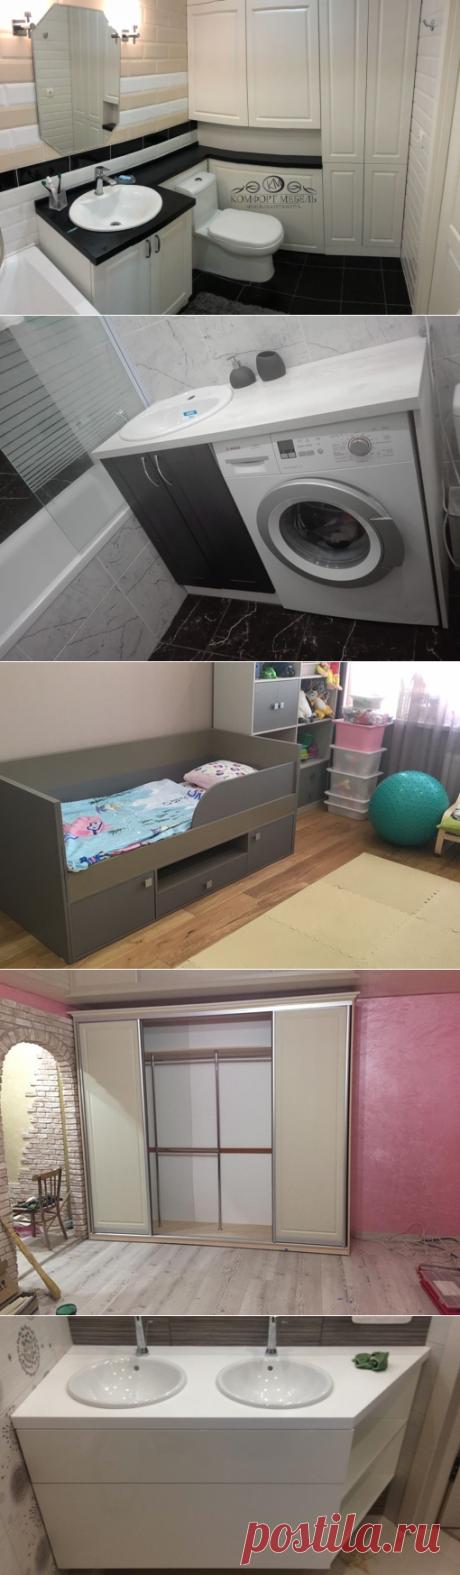 Мебель На Заказ | Кухни | Шкаф-купе | Детские